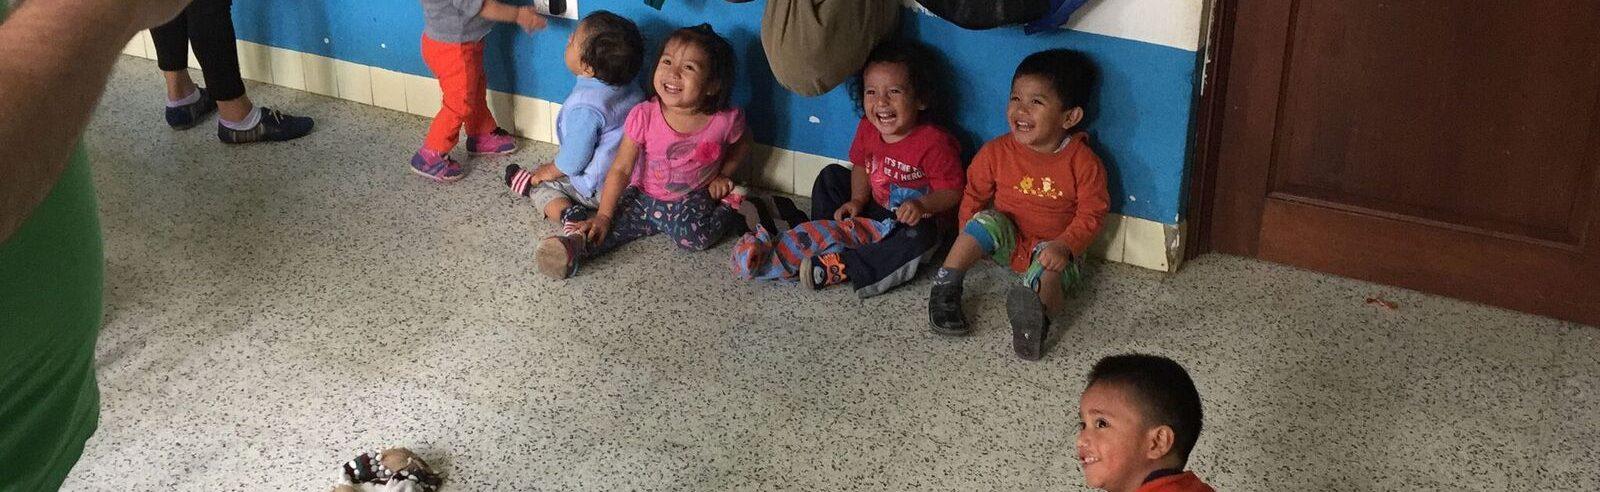 Guatemala, September 2018 Mission Trip Update (Pt. 3)